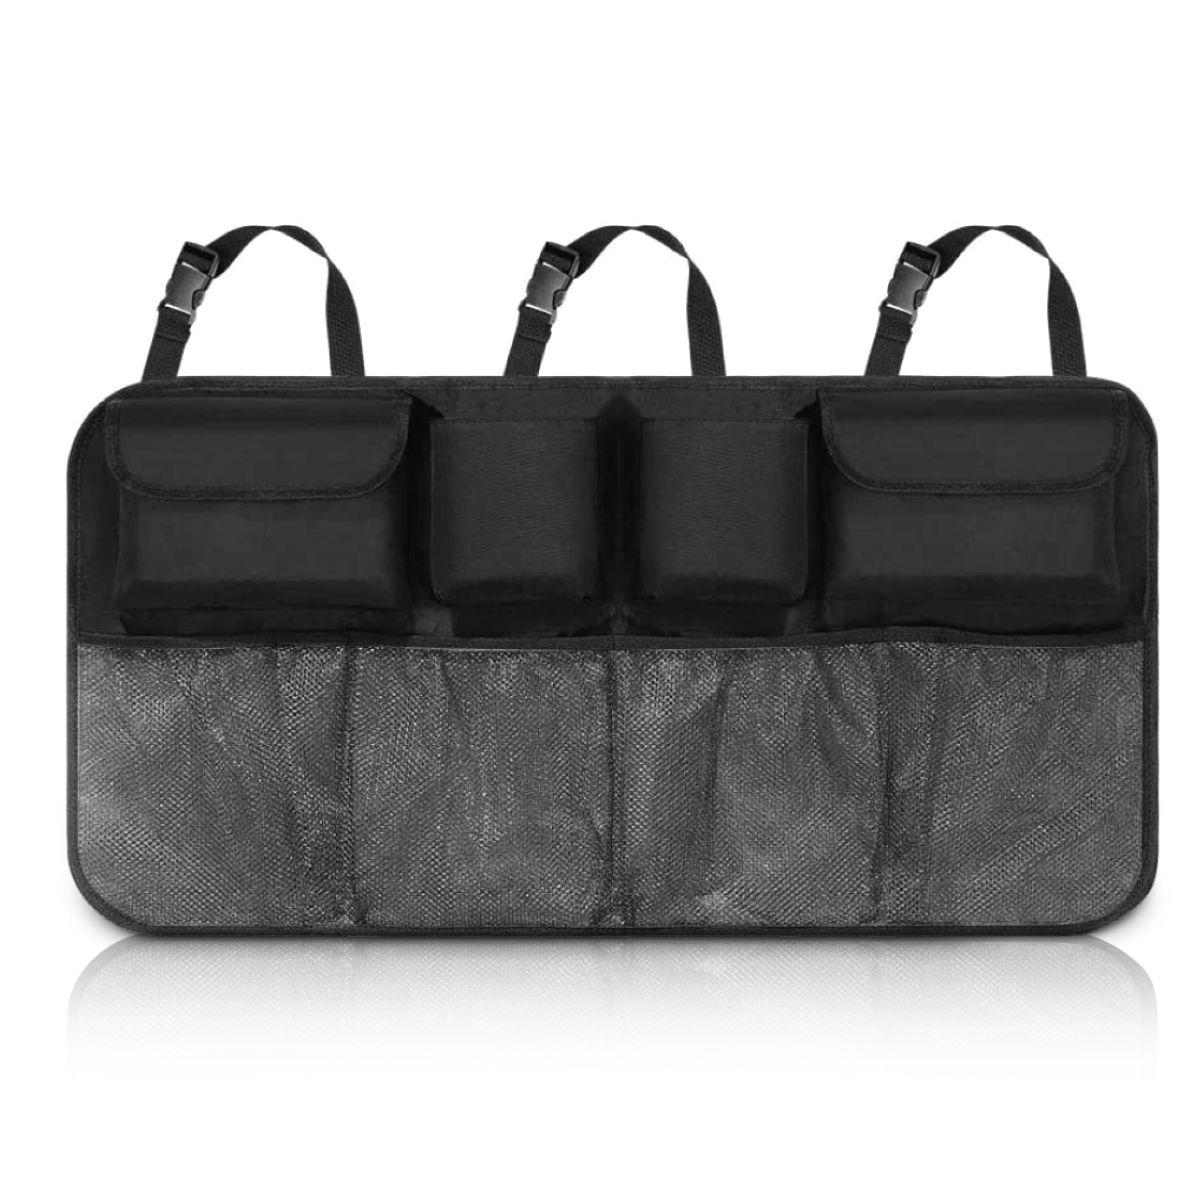 Car Boot Organiser tidy Back Seat Storage Bag Hanging Pocket Accessories Large 5060497647572  eBay